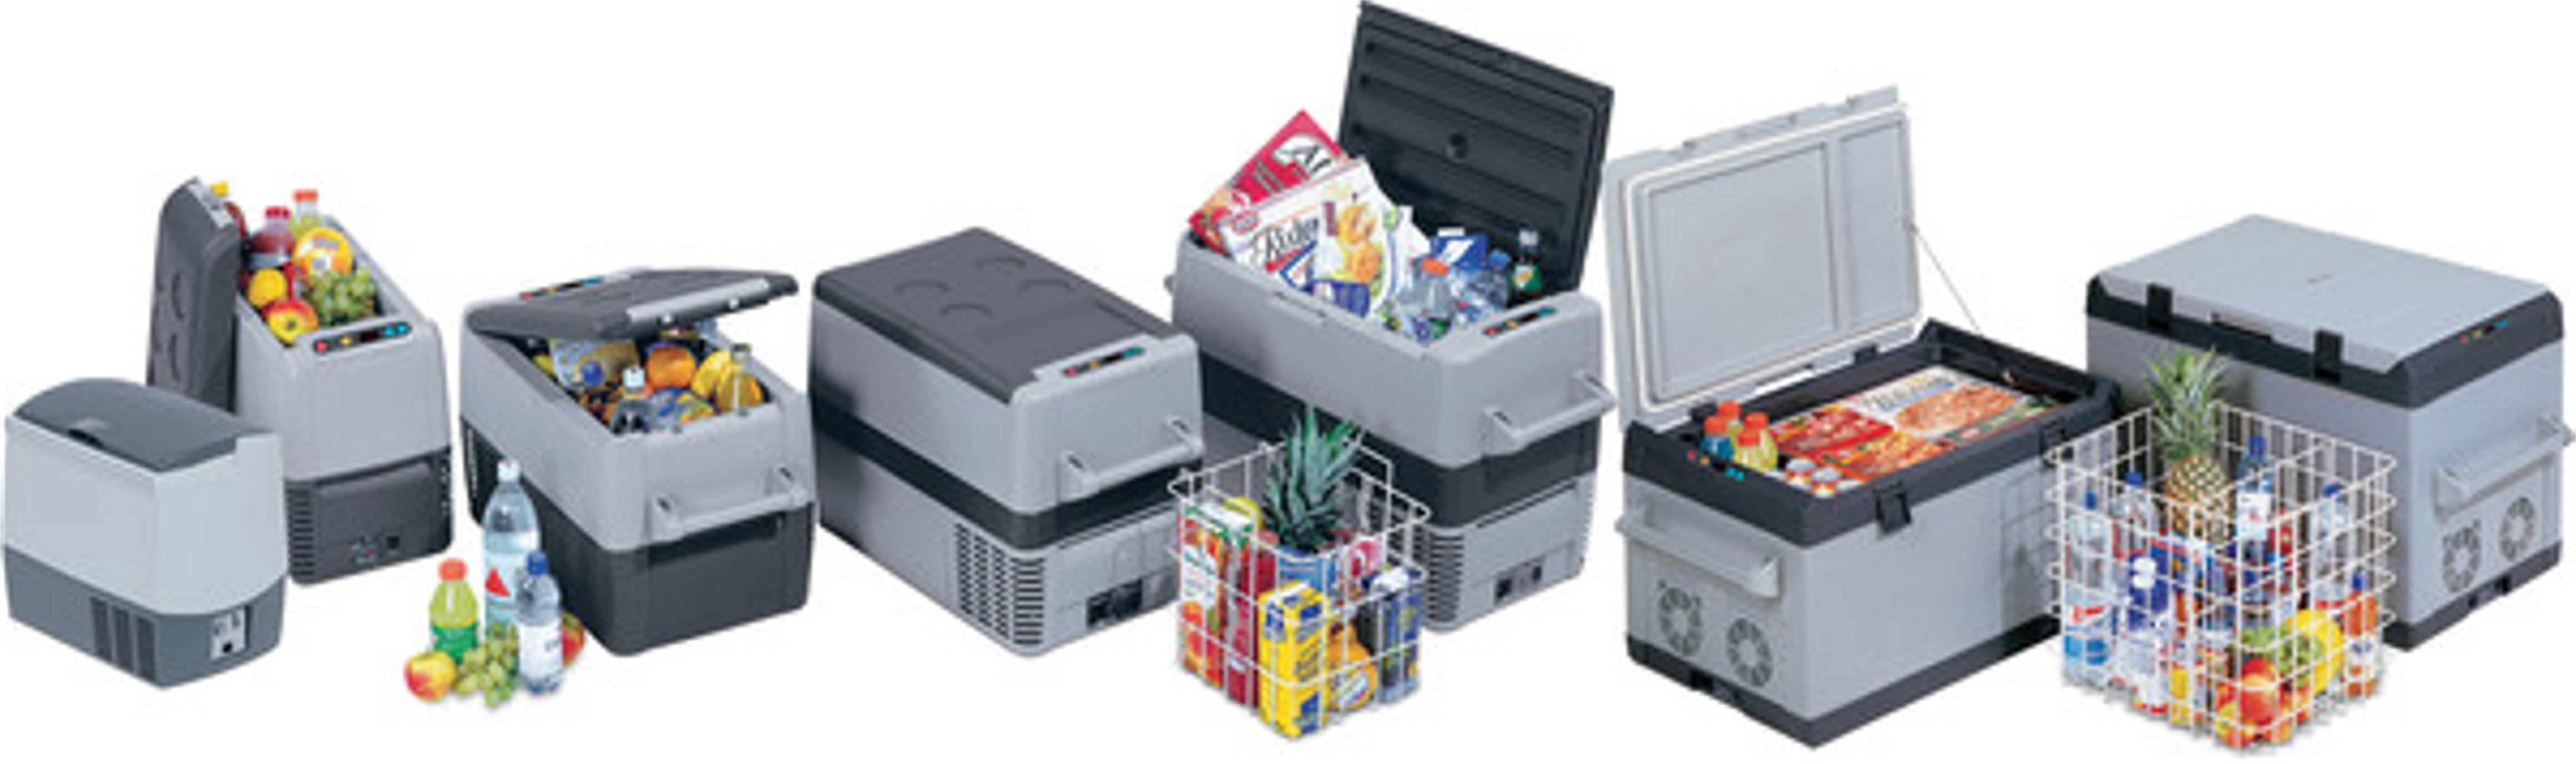 Dometic Cf 050ac110 Portable Freezer Refrigerator Most